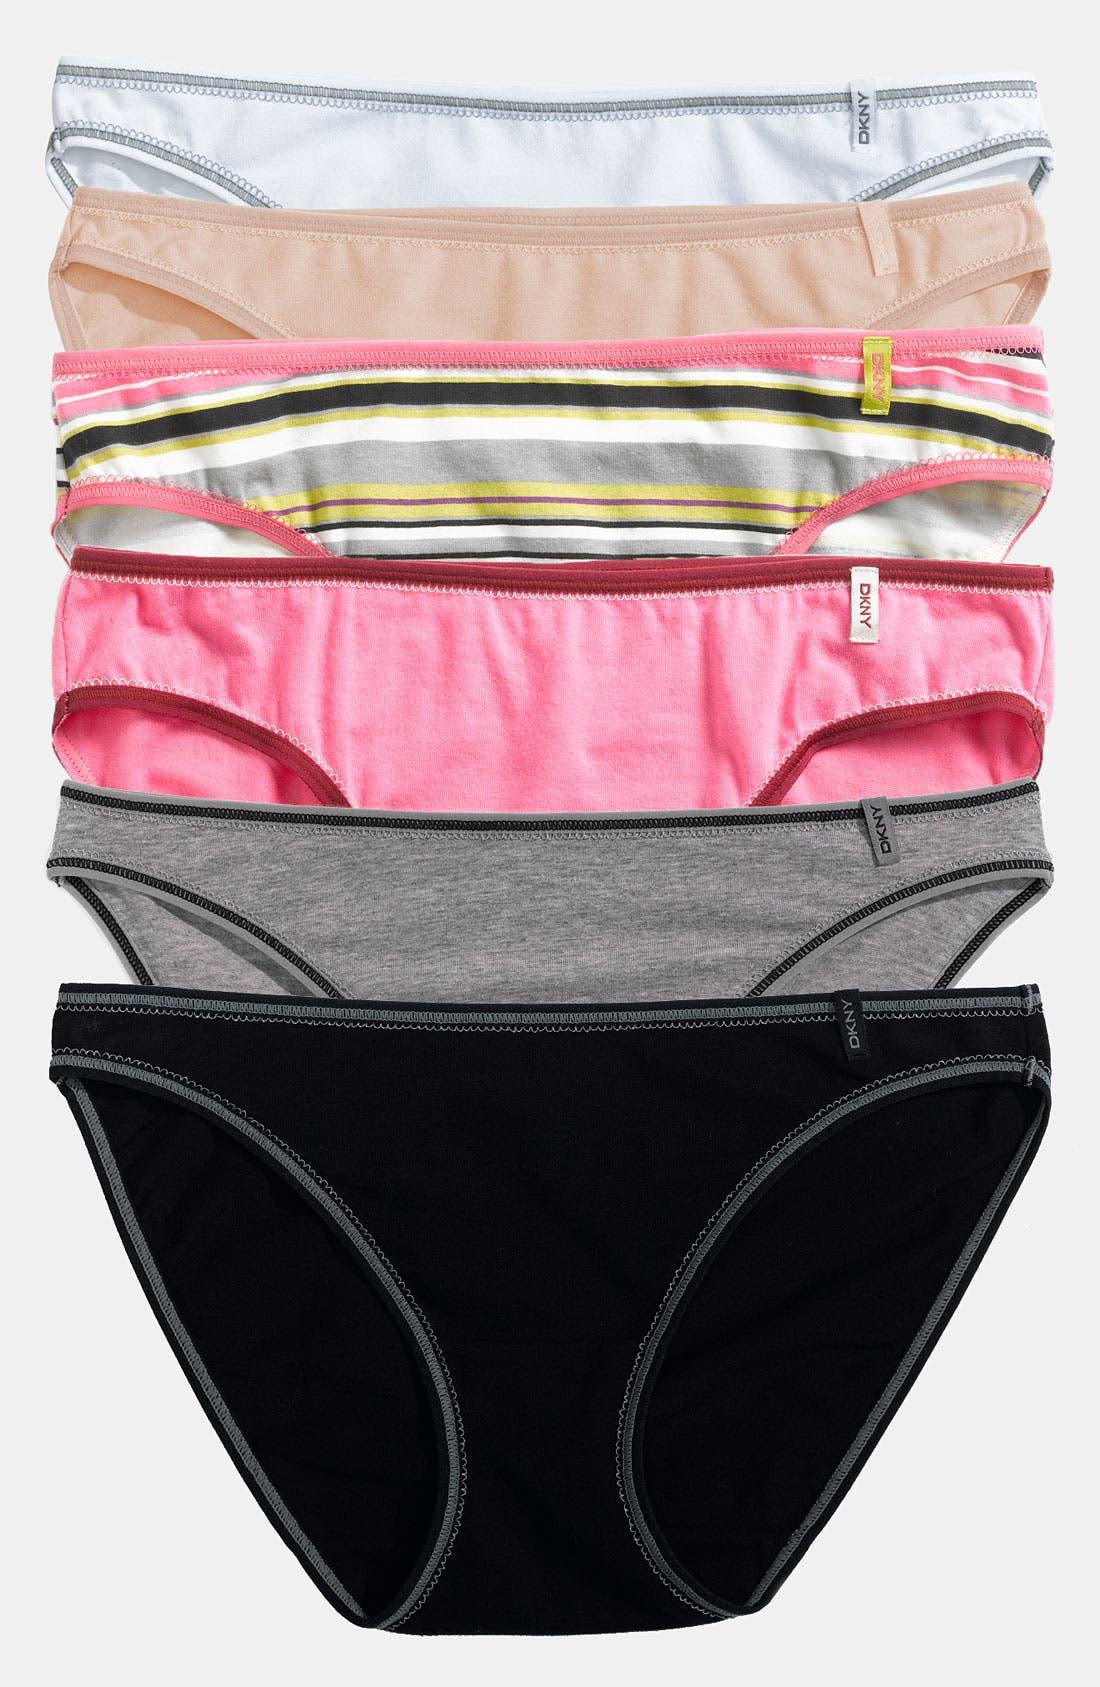 Alternate Image 1 Selected - DKNY 'Comfort Classic' Bikini (3 for $27)